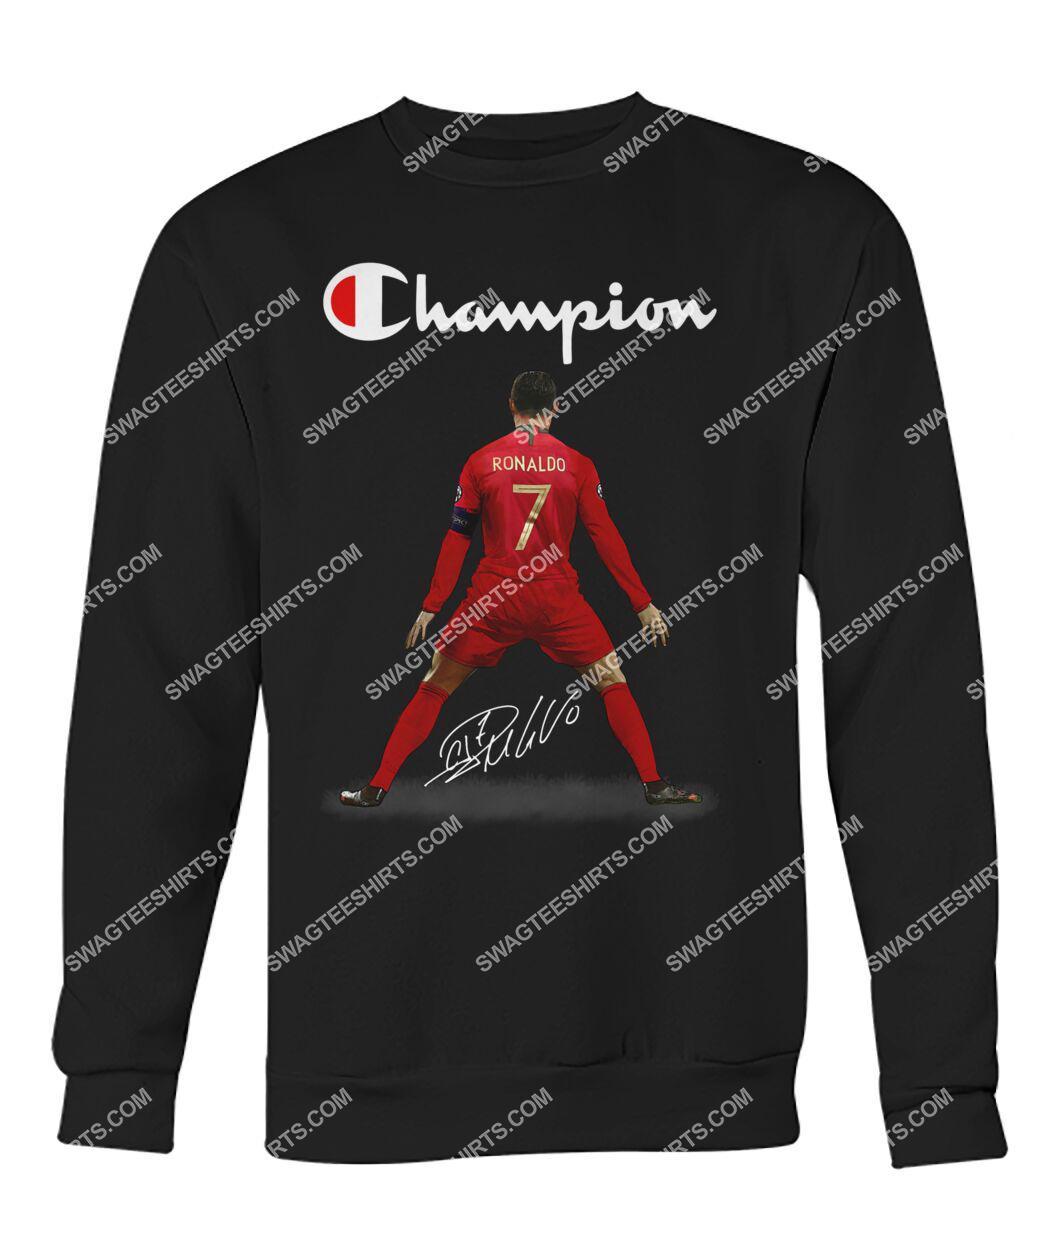 champion cristiano ronaldo signature sweatshirt 1